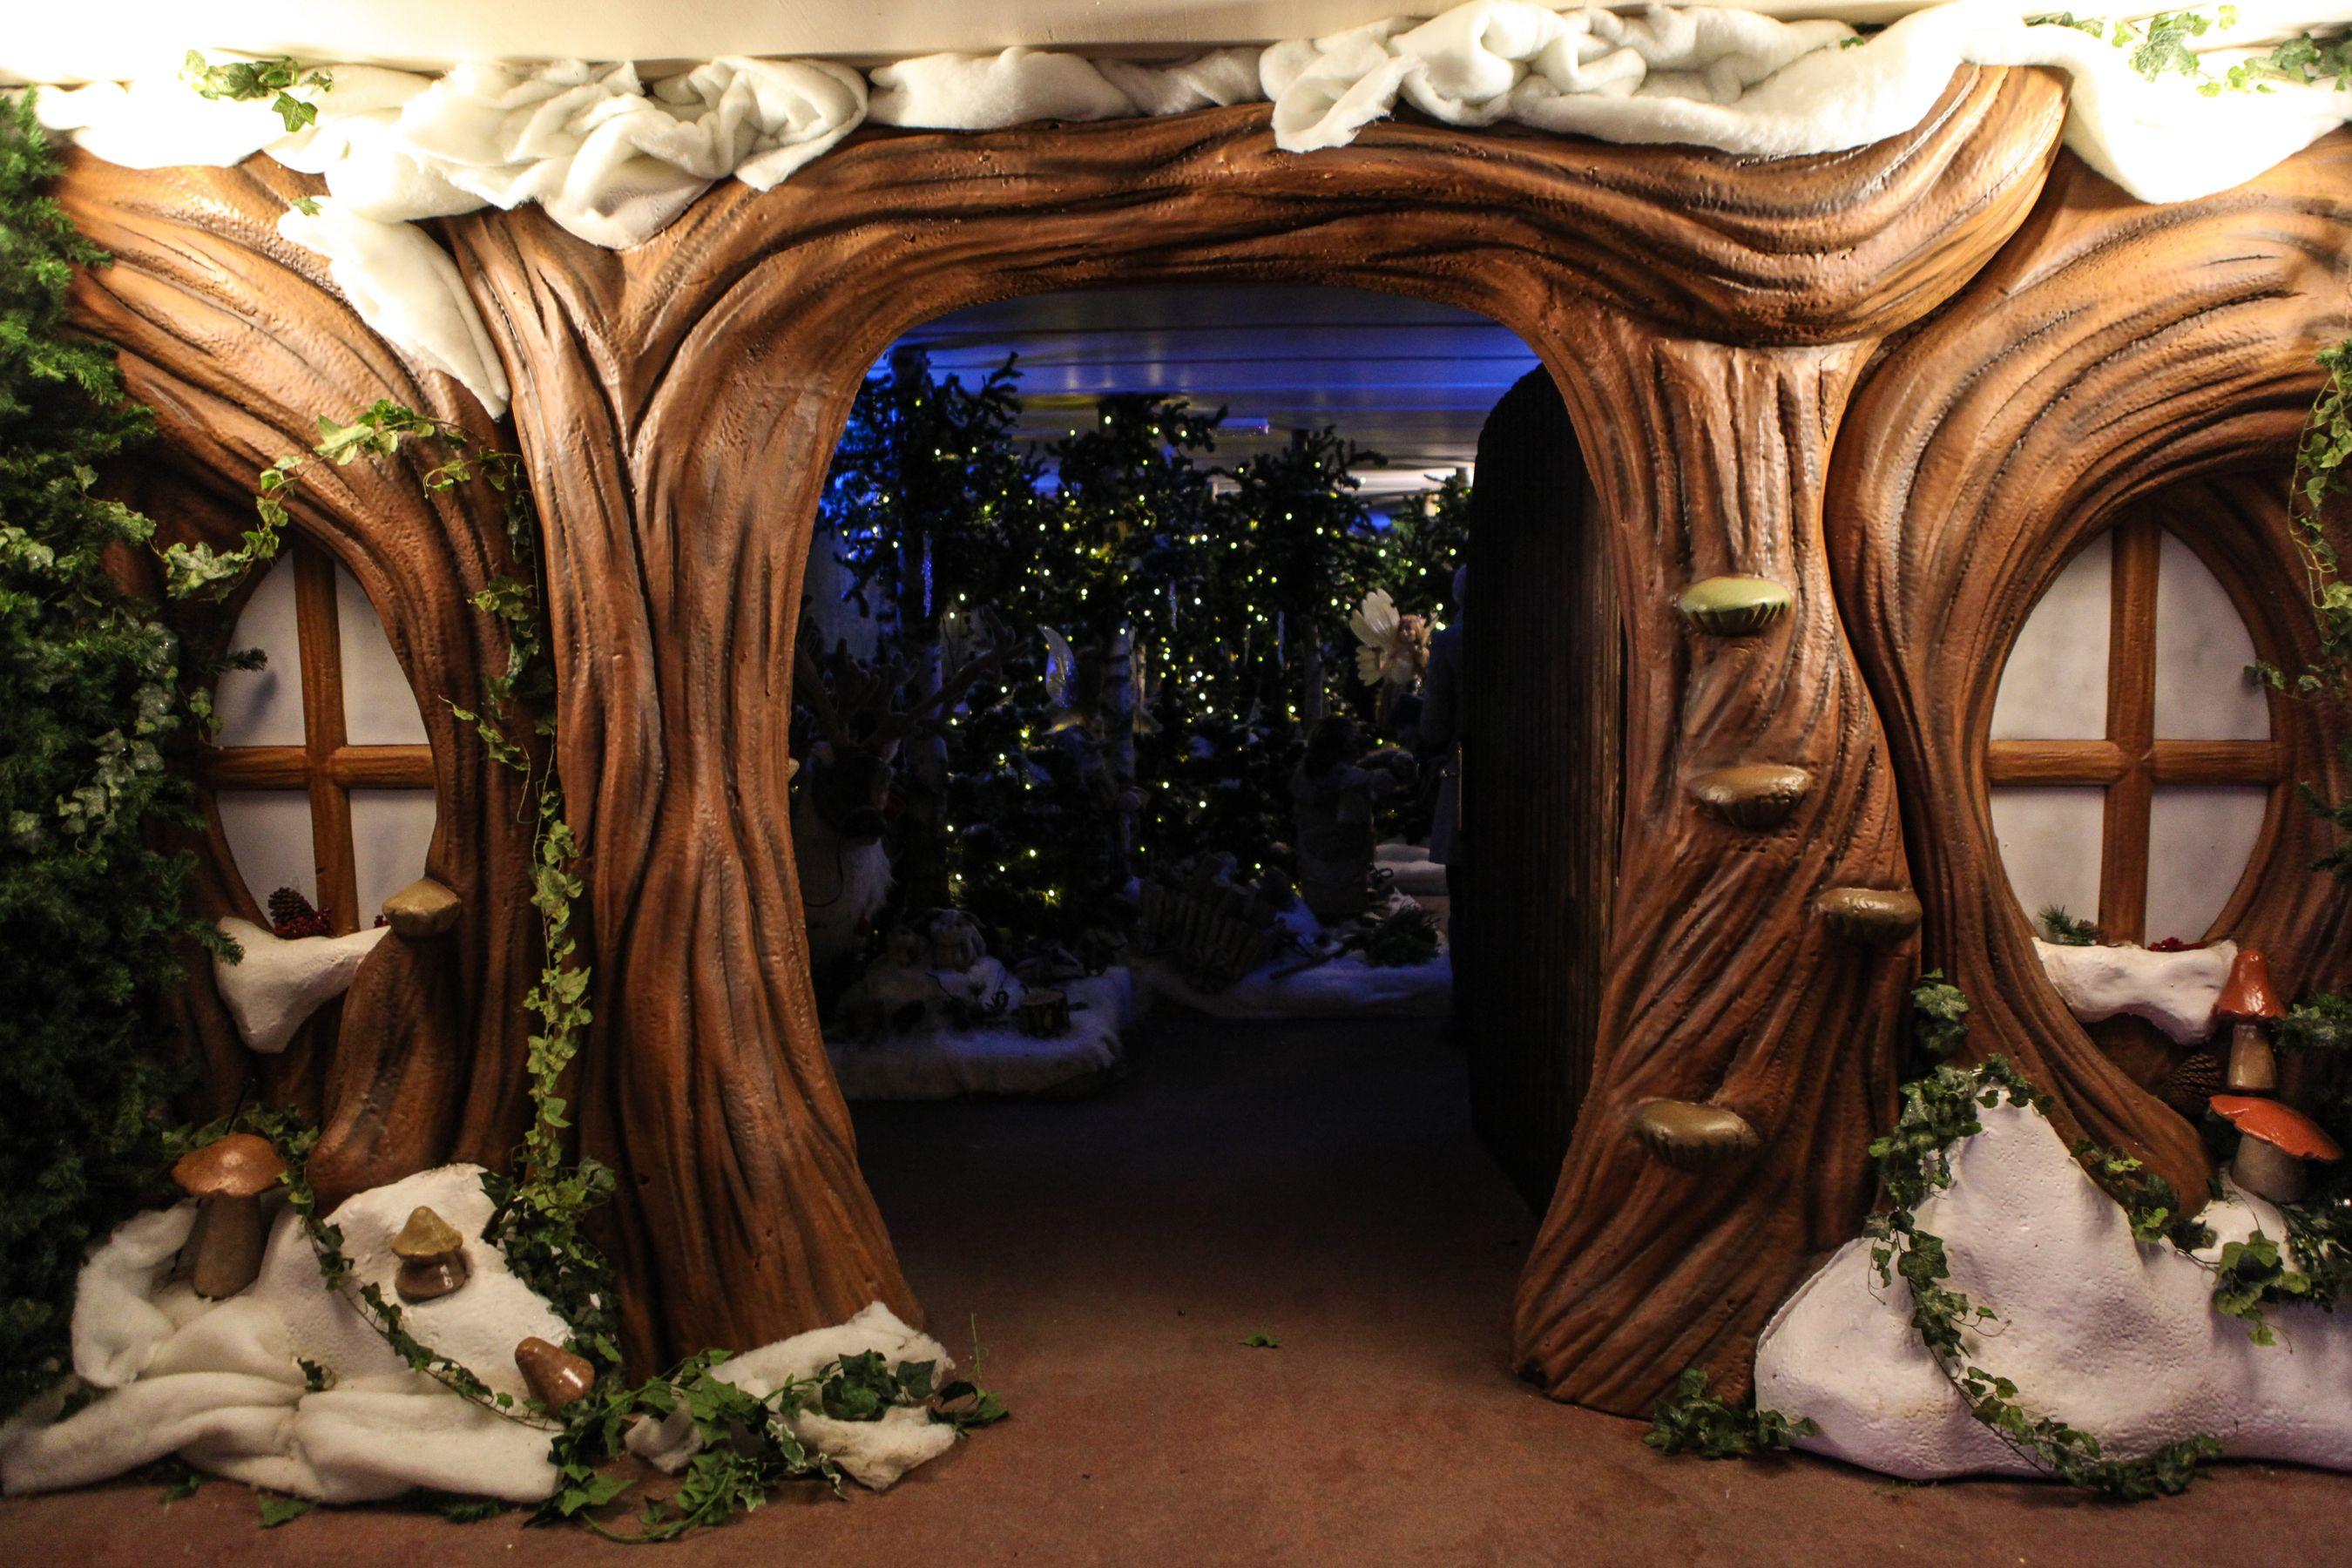 Enchanted forest winter wonderland pinterest forest for Enchanted forest bedroom ideas